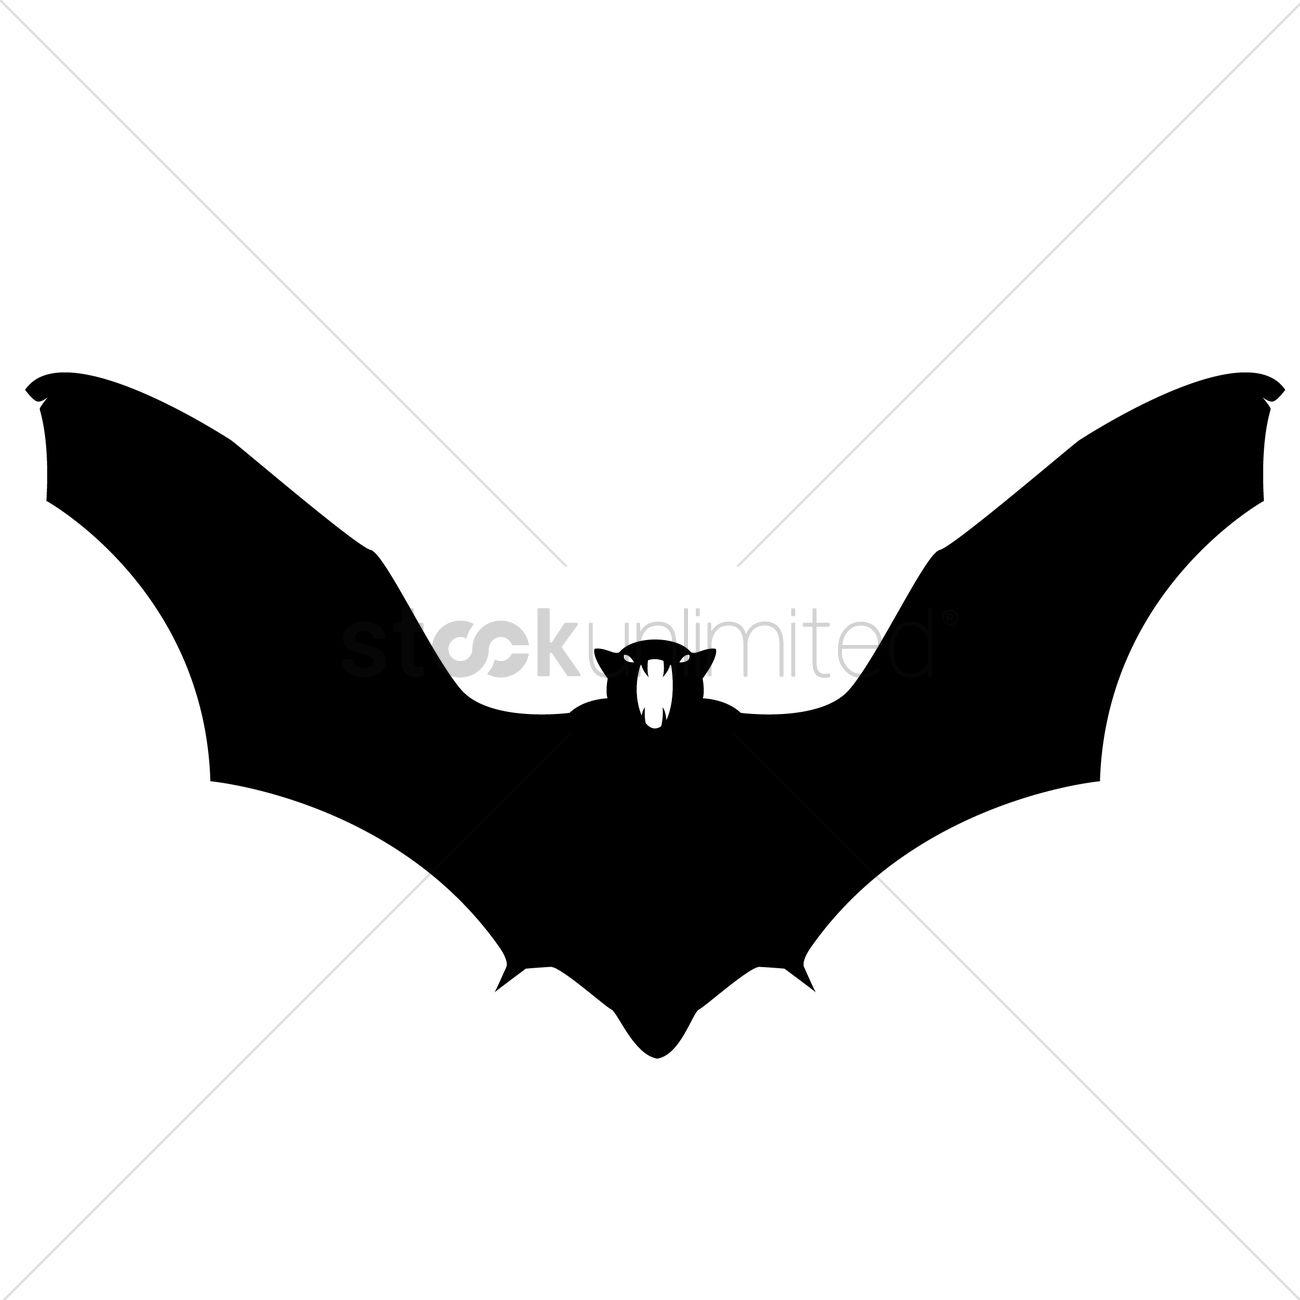 1300x1300 Bat Silhouette Vector Image